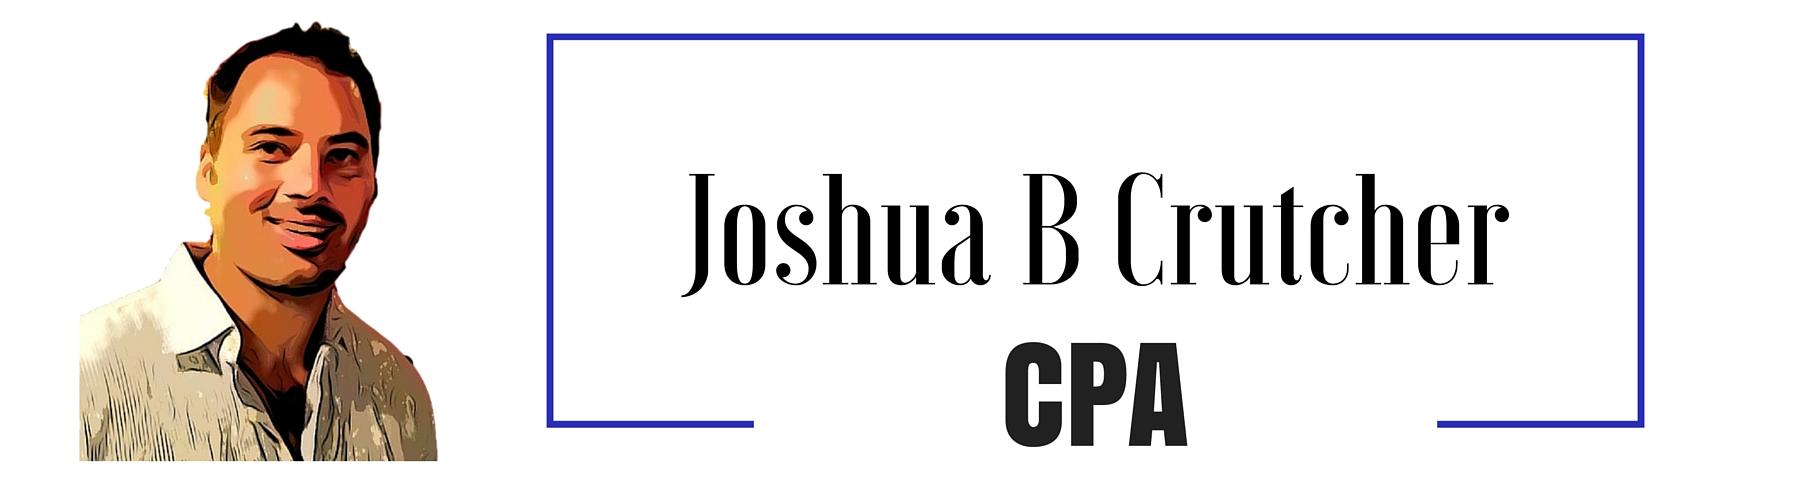 Joshua B Crutcher